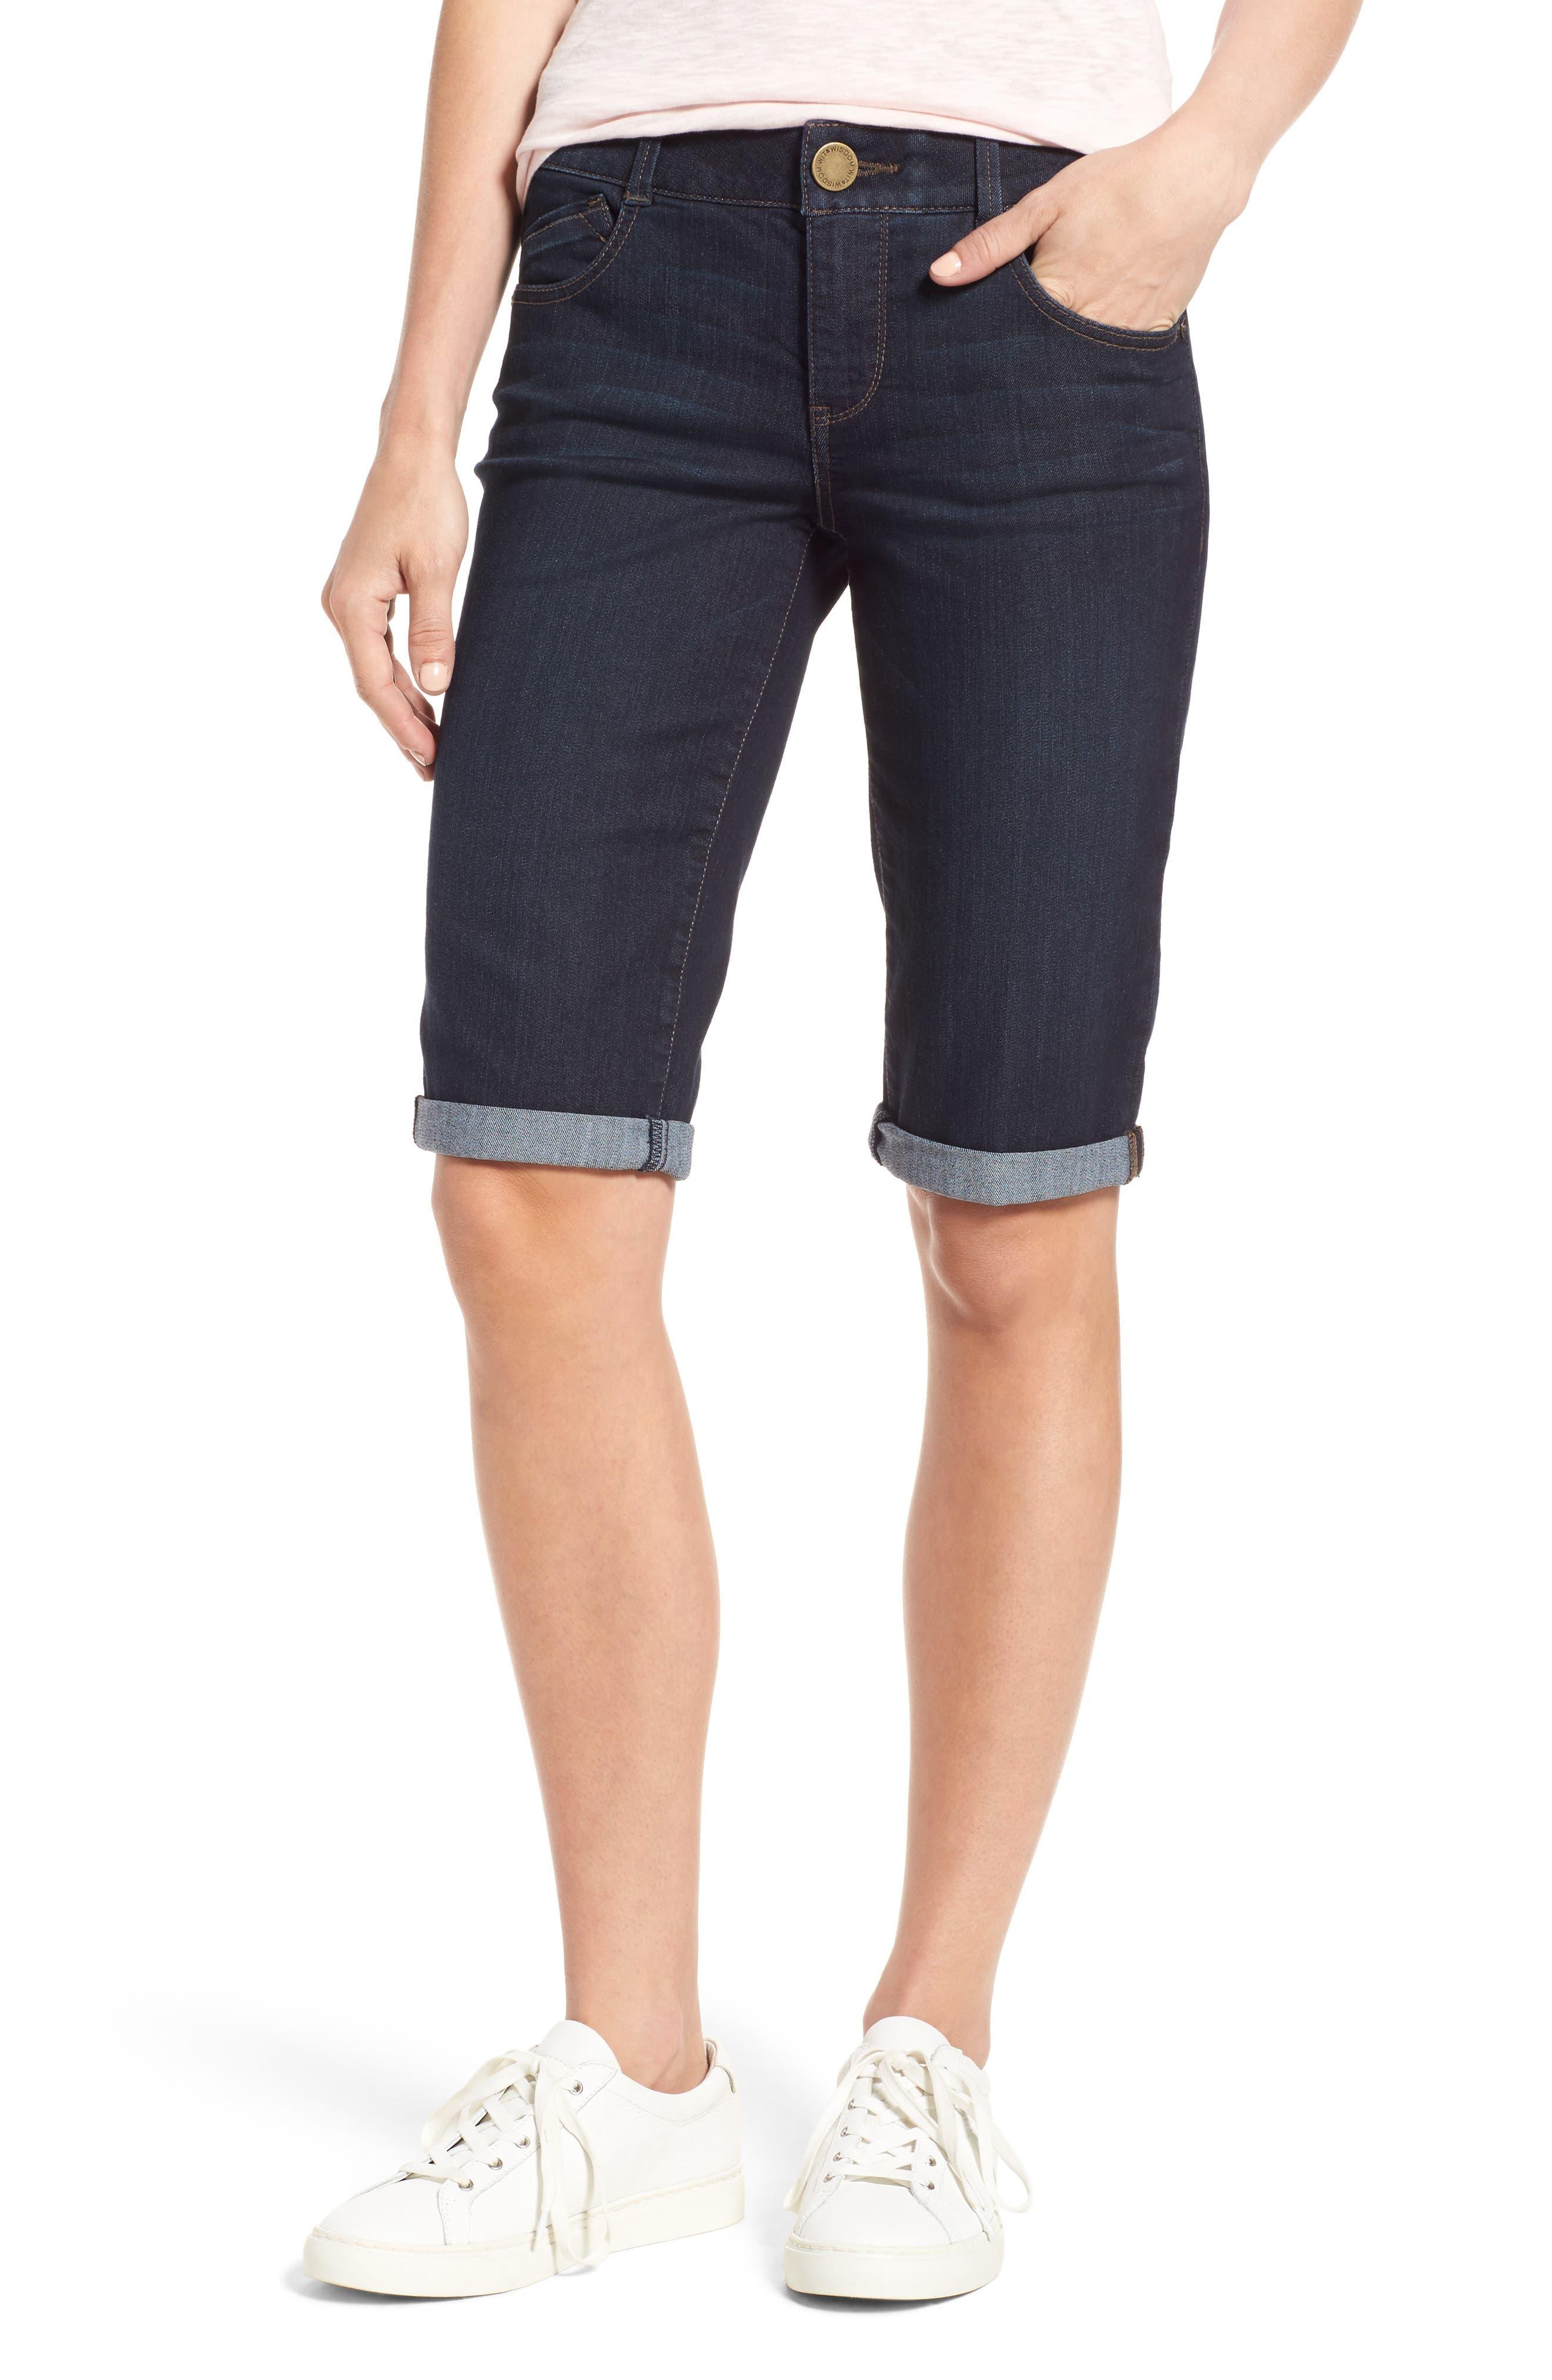 Main Image - Wit & Wisdom Ab-solution Denim Bermuda Shorts (Regular & Petite) (Nordstrom Exclusive)